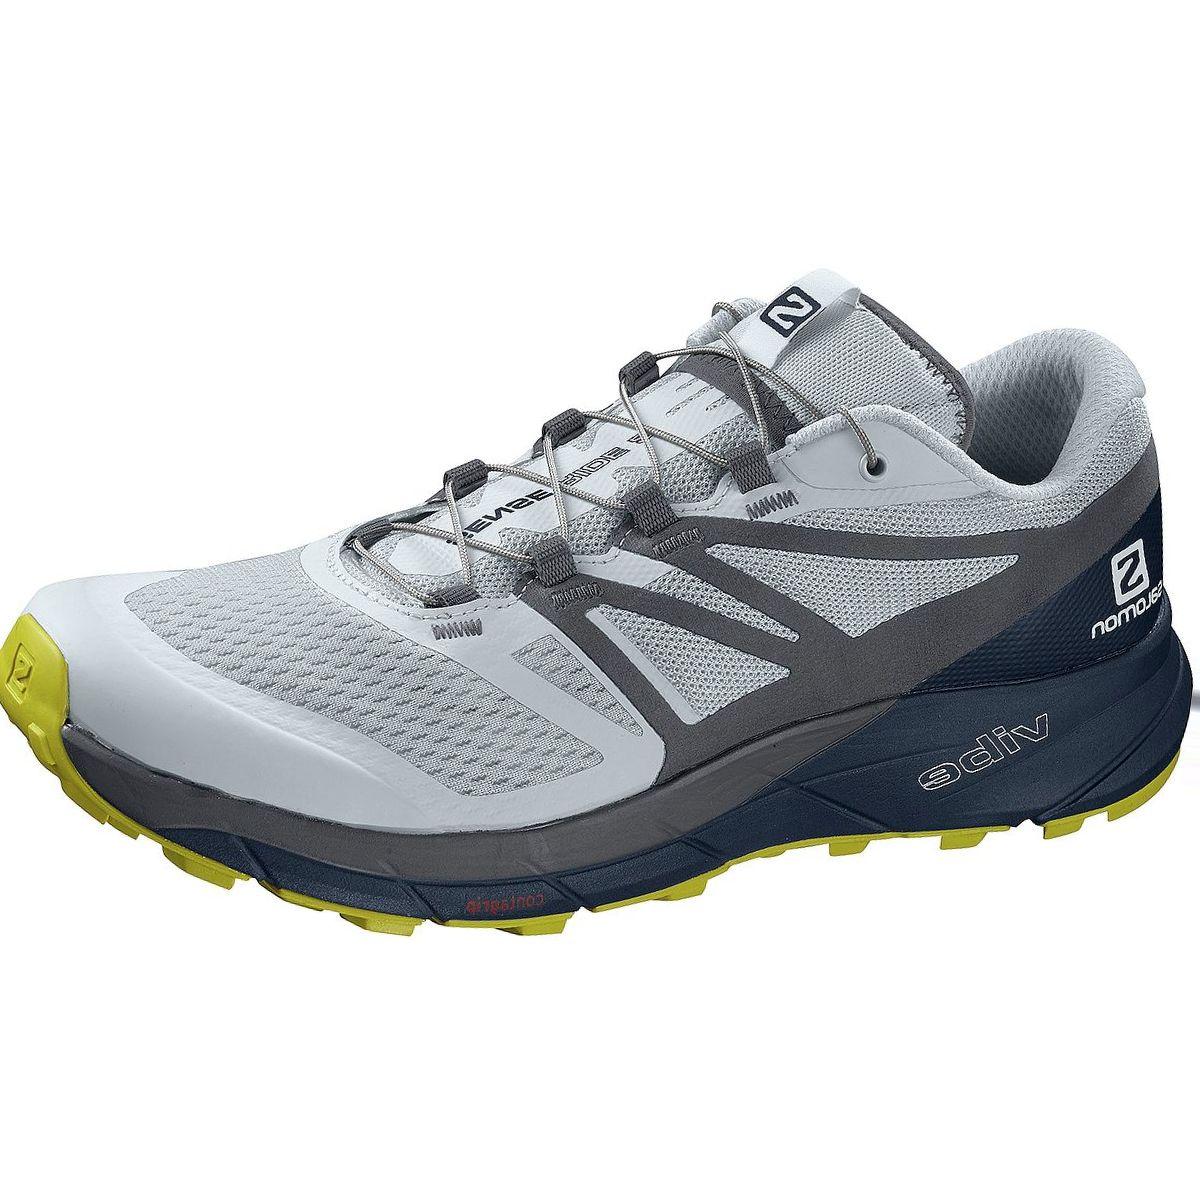 Salomon Sense Ride 2 Trail Running Shoe - Men's